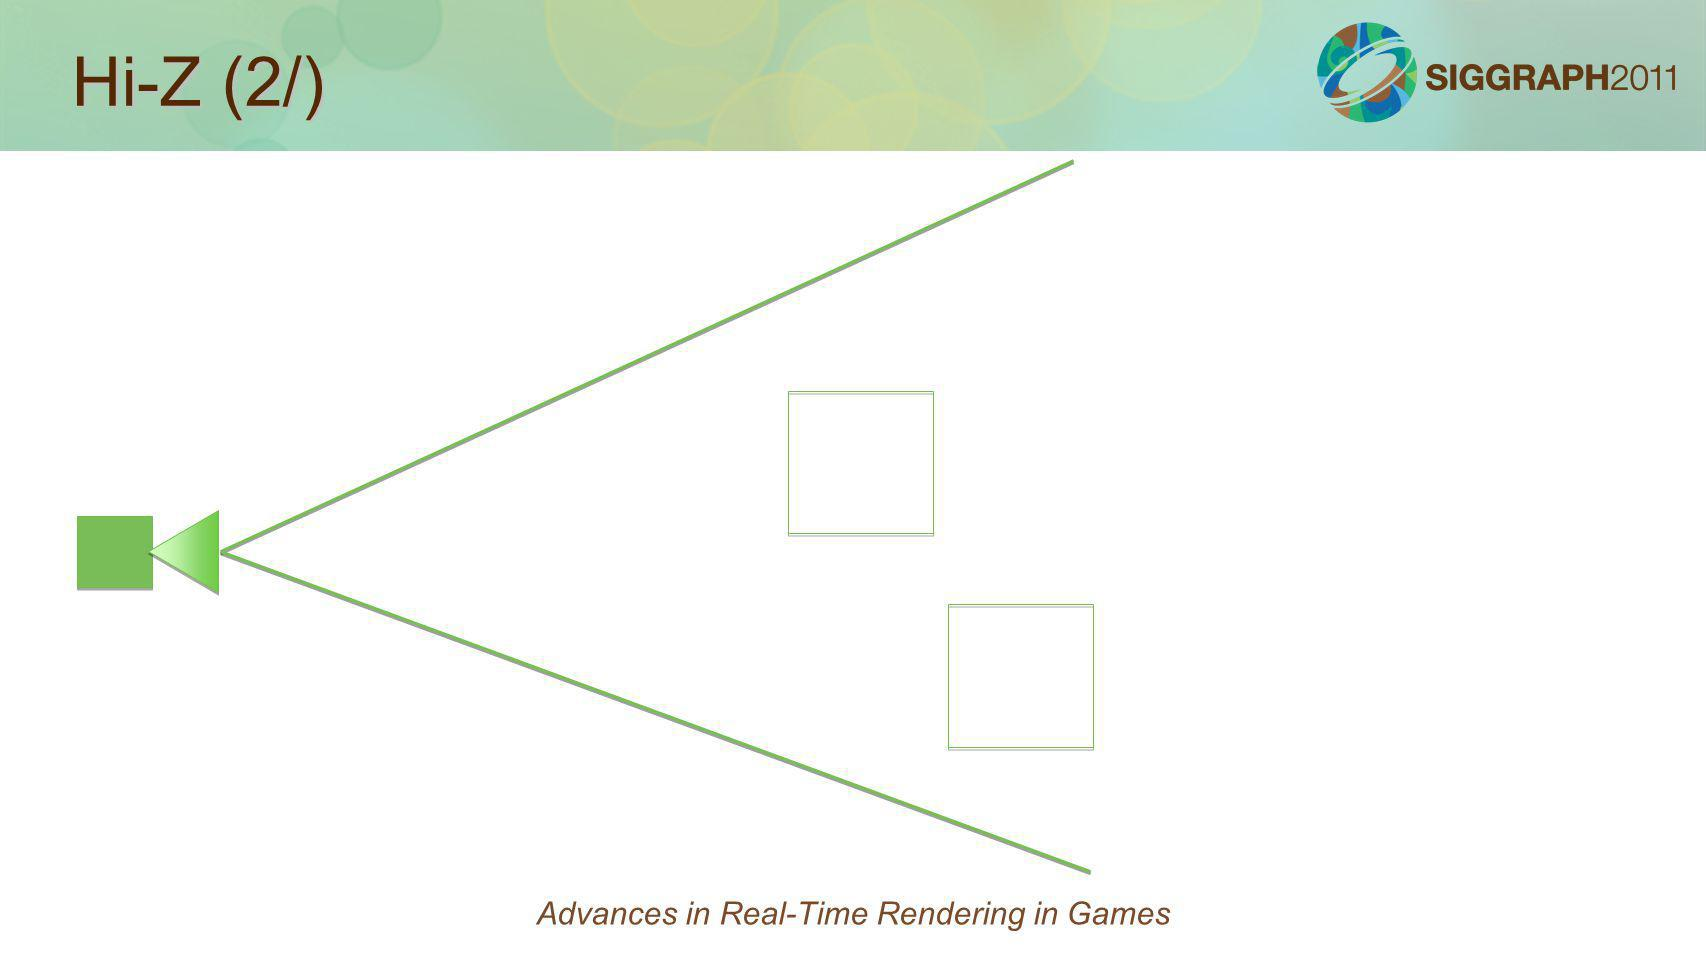 Hi-Z (2/) Advances in Real-Time Rendering in Games